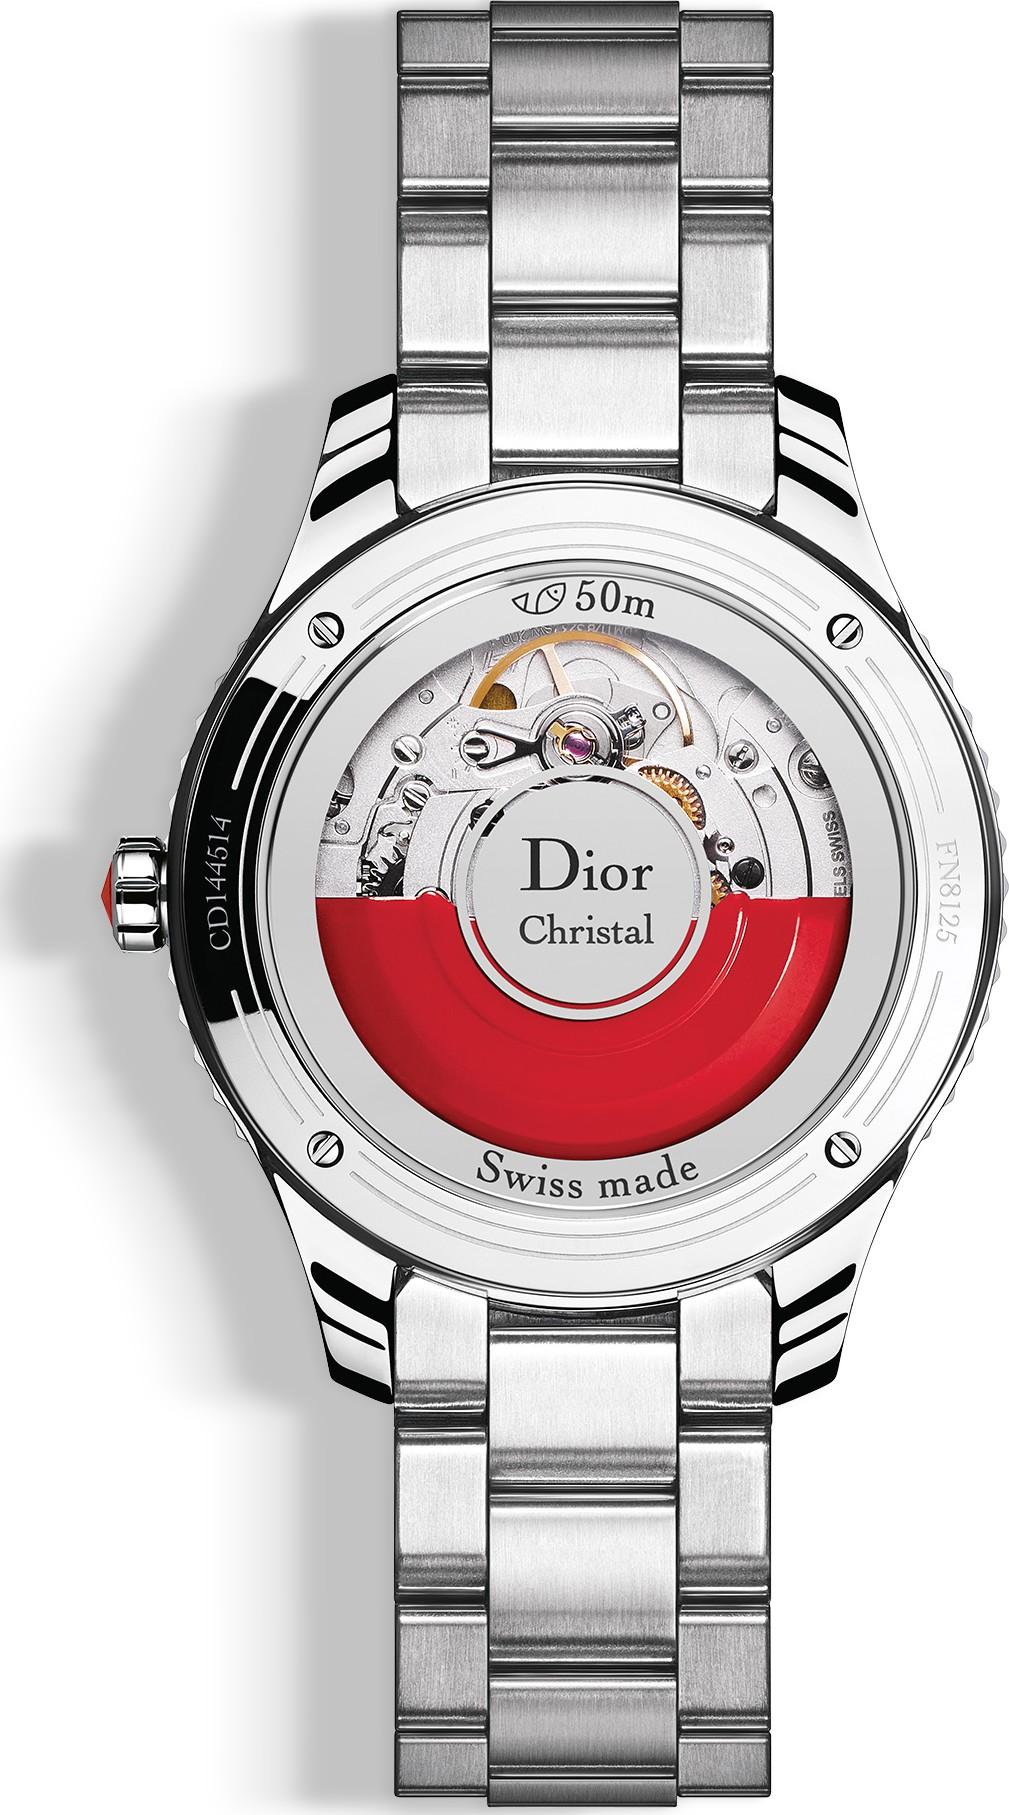 dong-ho-nu-christian-dior-CD144514M001 (1)